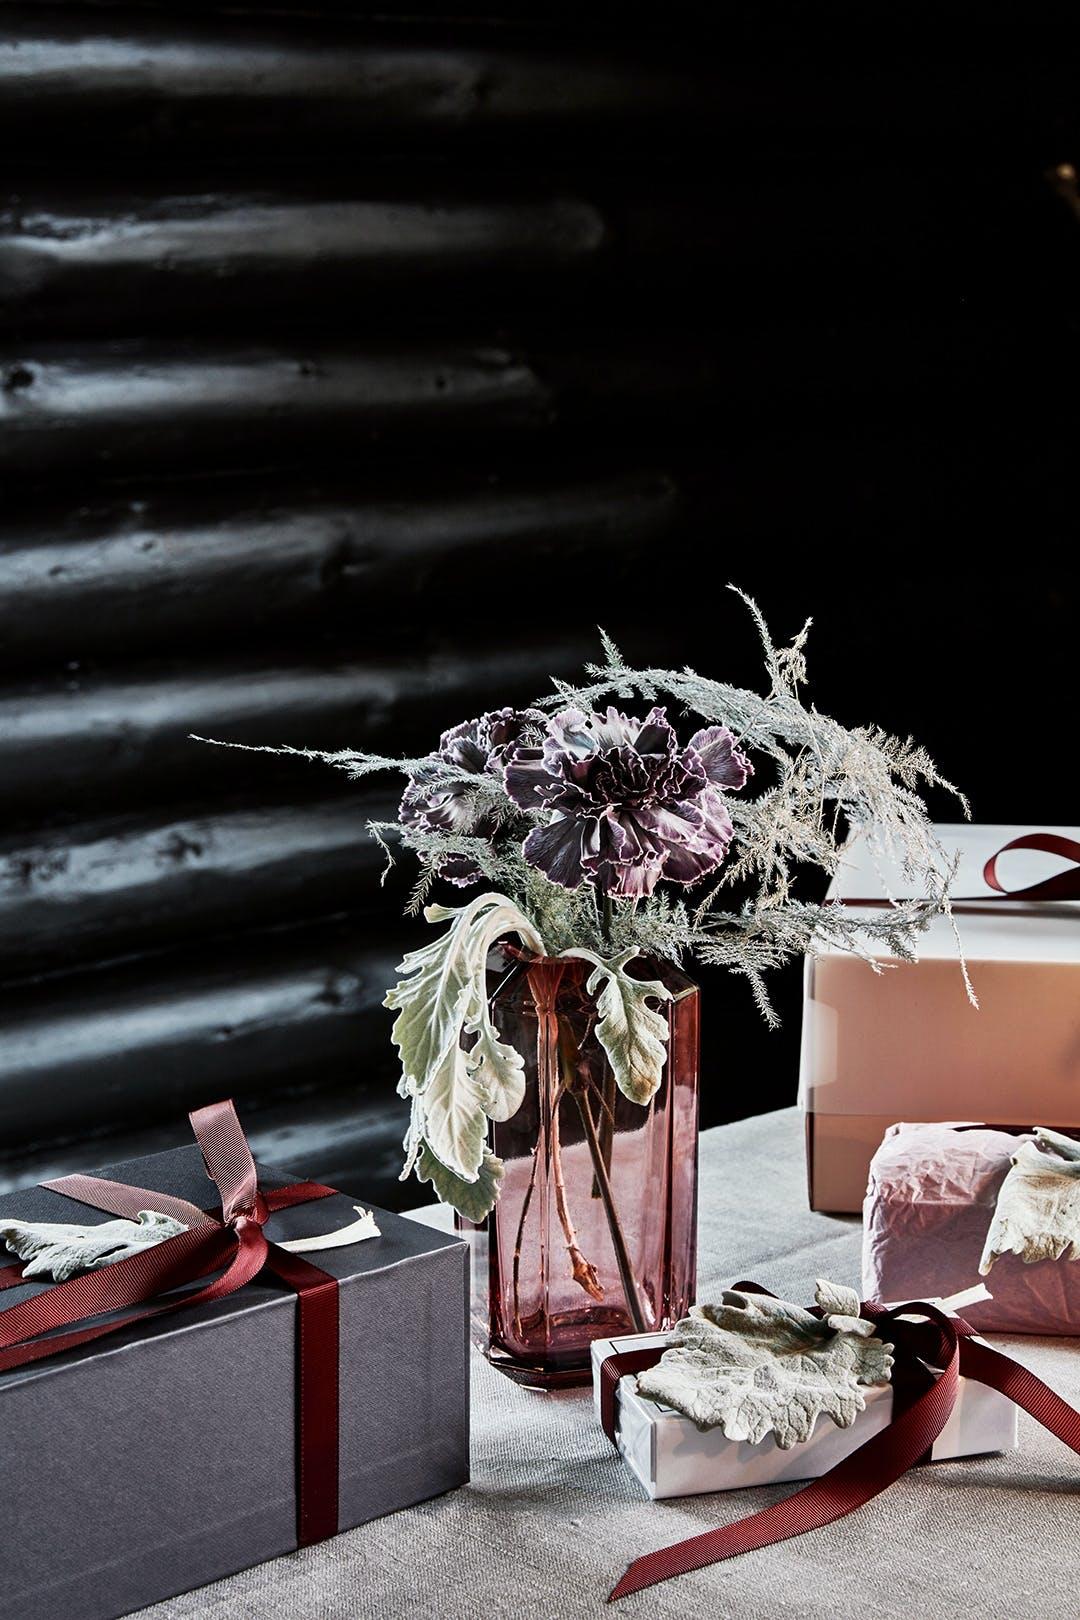 jul gaver julegaver pynt julepynt juledekoration